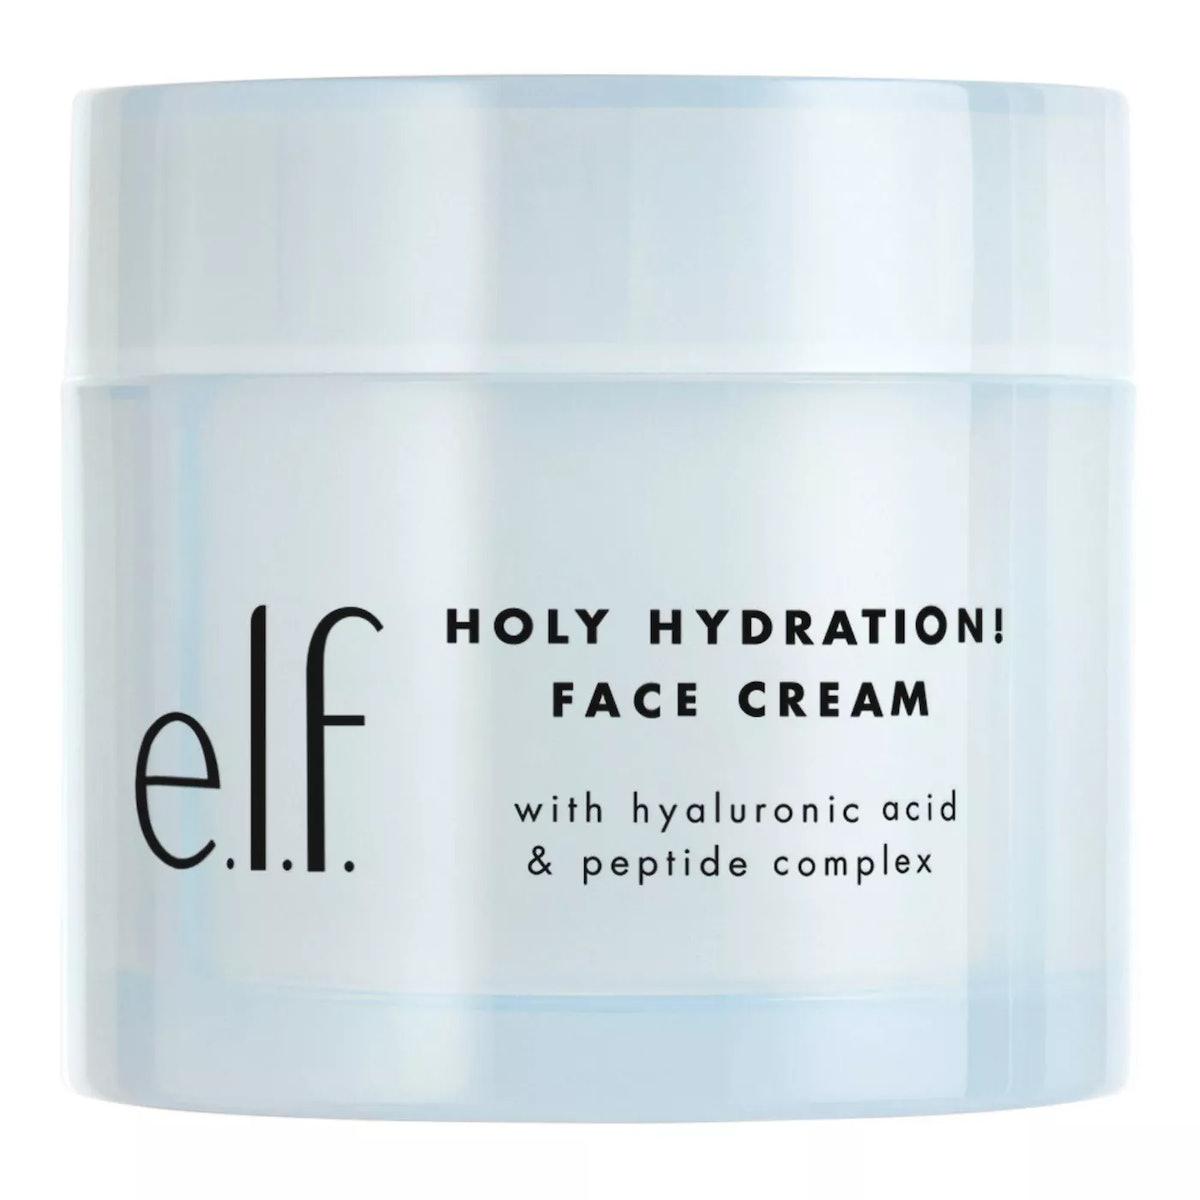 e.l.f. Holy Hydration! Face Cream